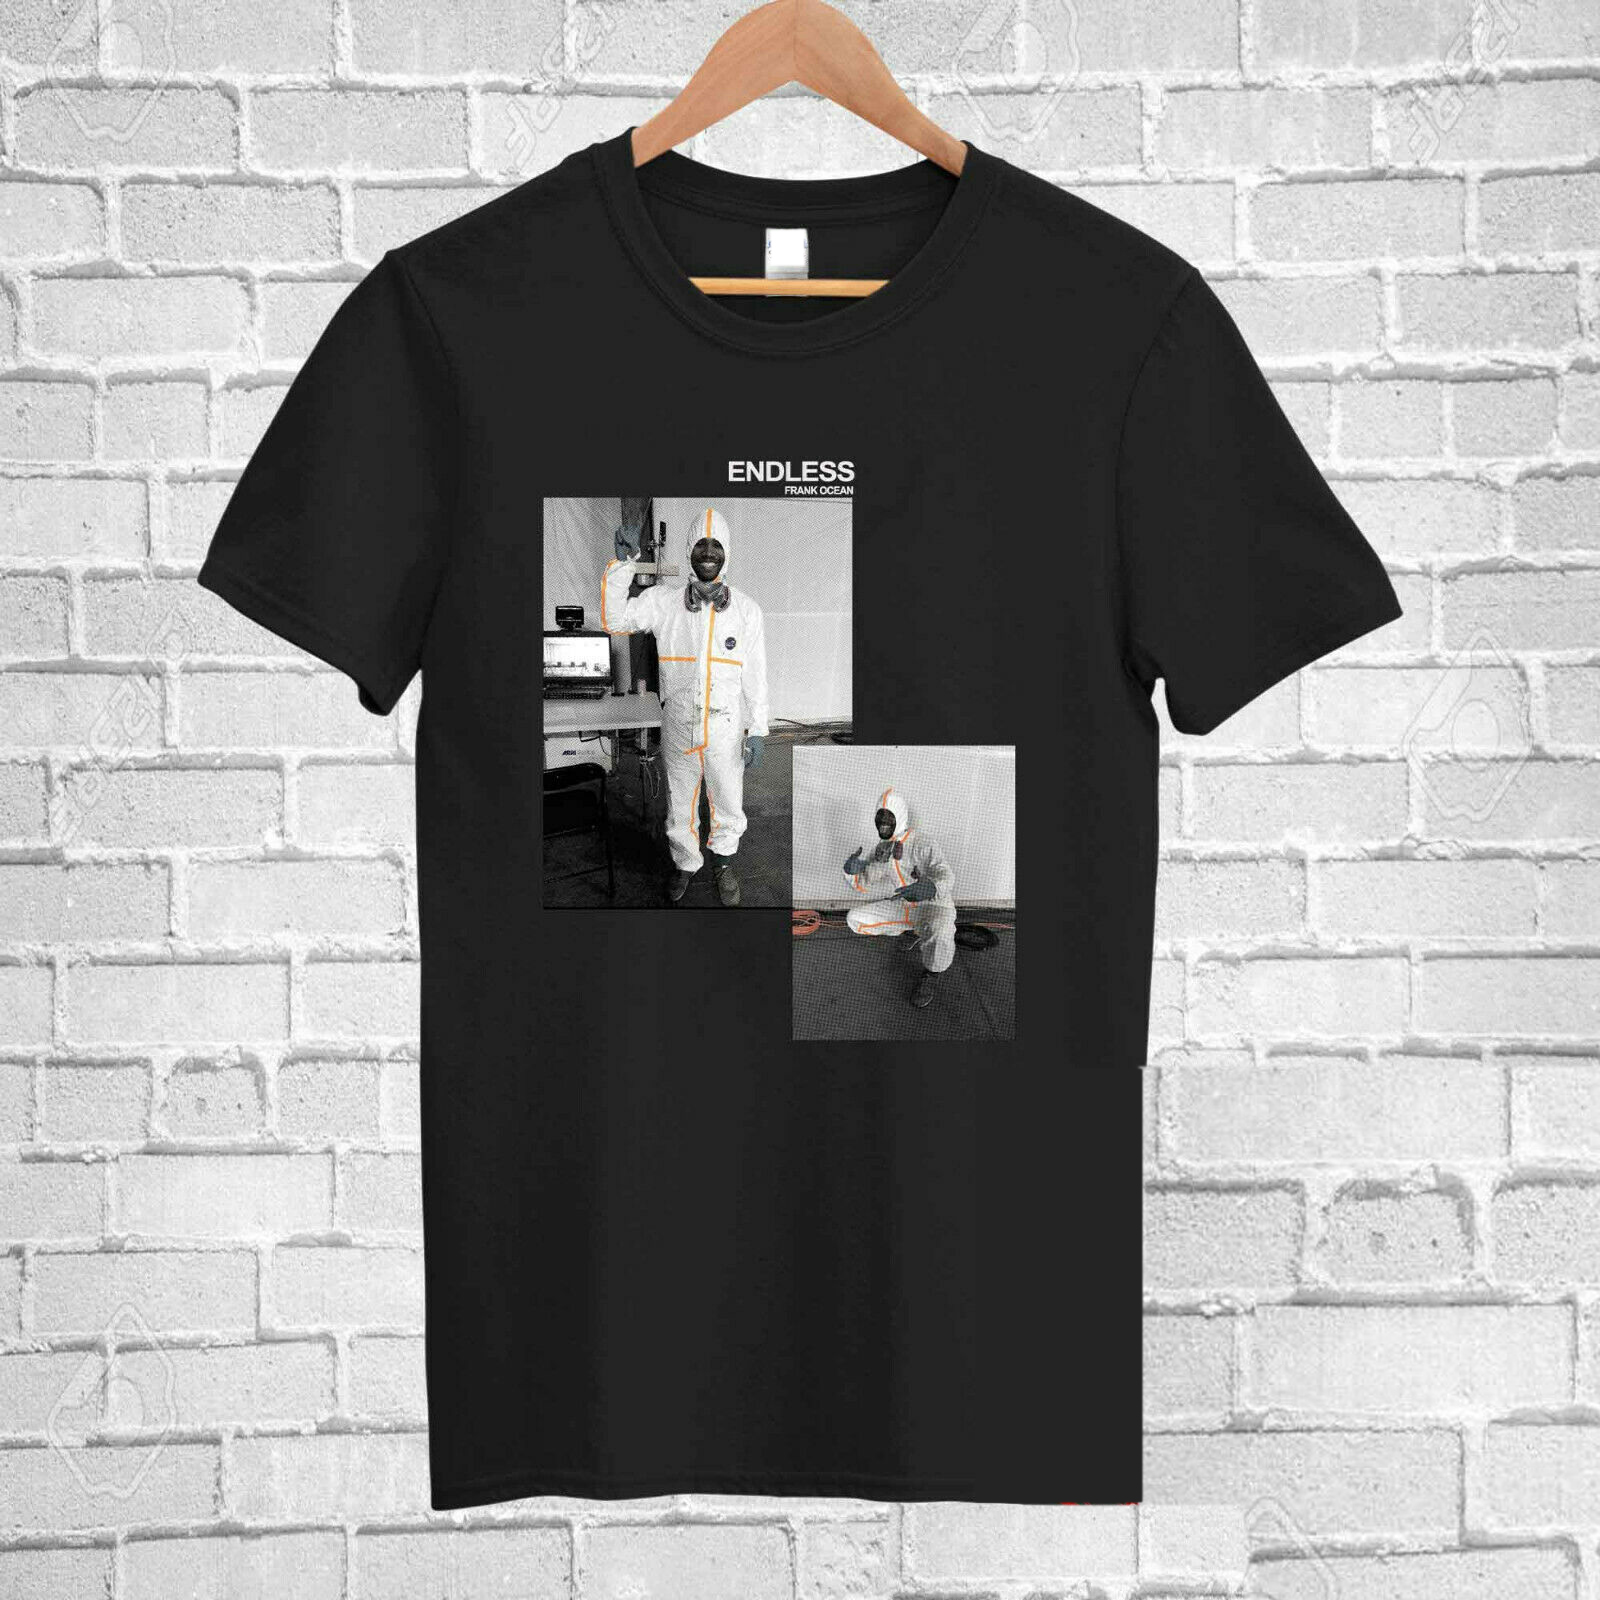 Frank Ocean Endless 90s Vintage Black Tshirt Reprint  S M L XL XXL 3XL 2018 Summer New Brand T Shirt Men Hip Hop T-Shirt